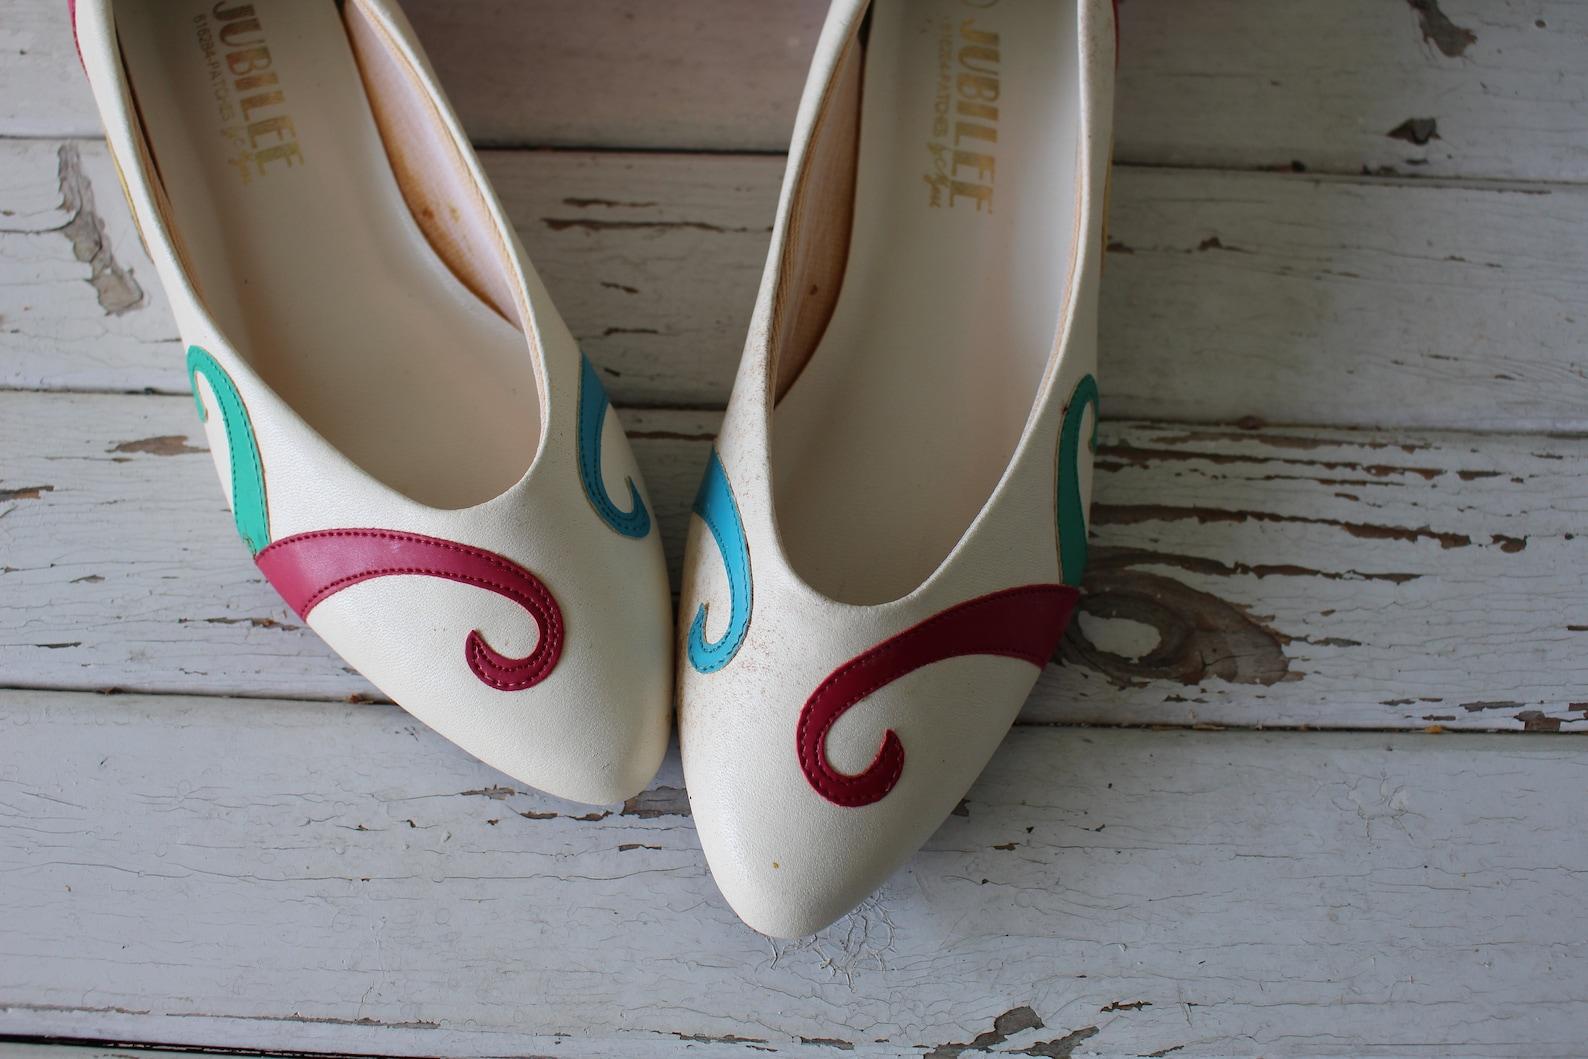 vintage rainbow flats...size 6.5 womens....ballet shoes. 80s flats. retro. jubilee urban. boho. hipster. fancy. pretty. mod. par